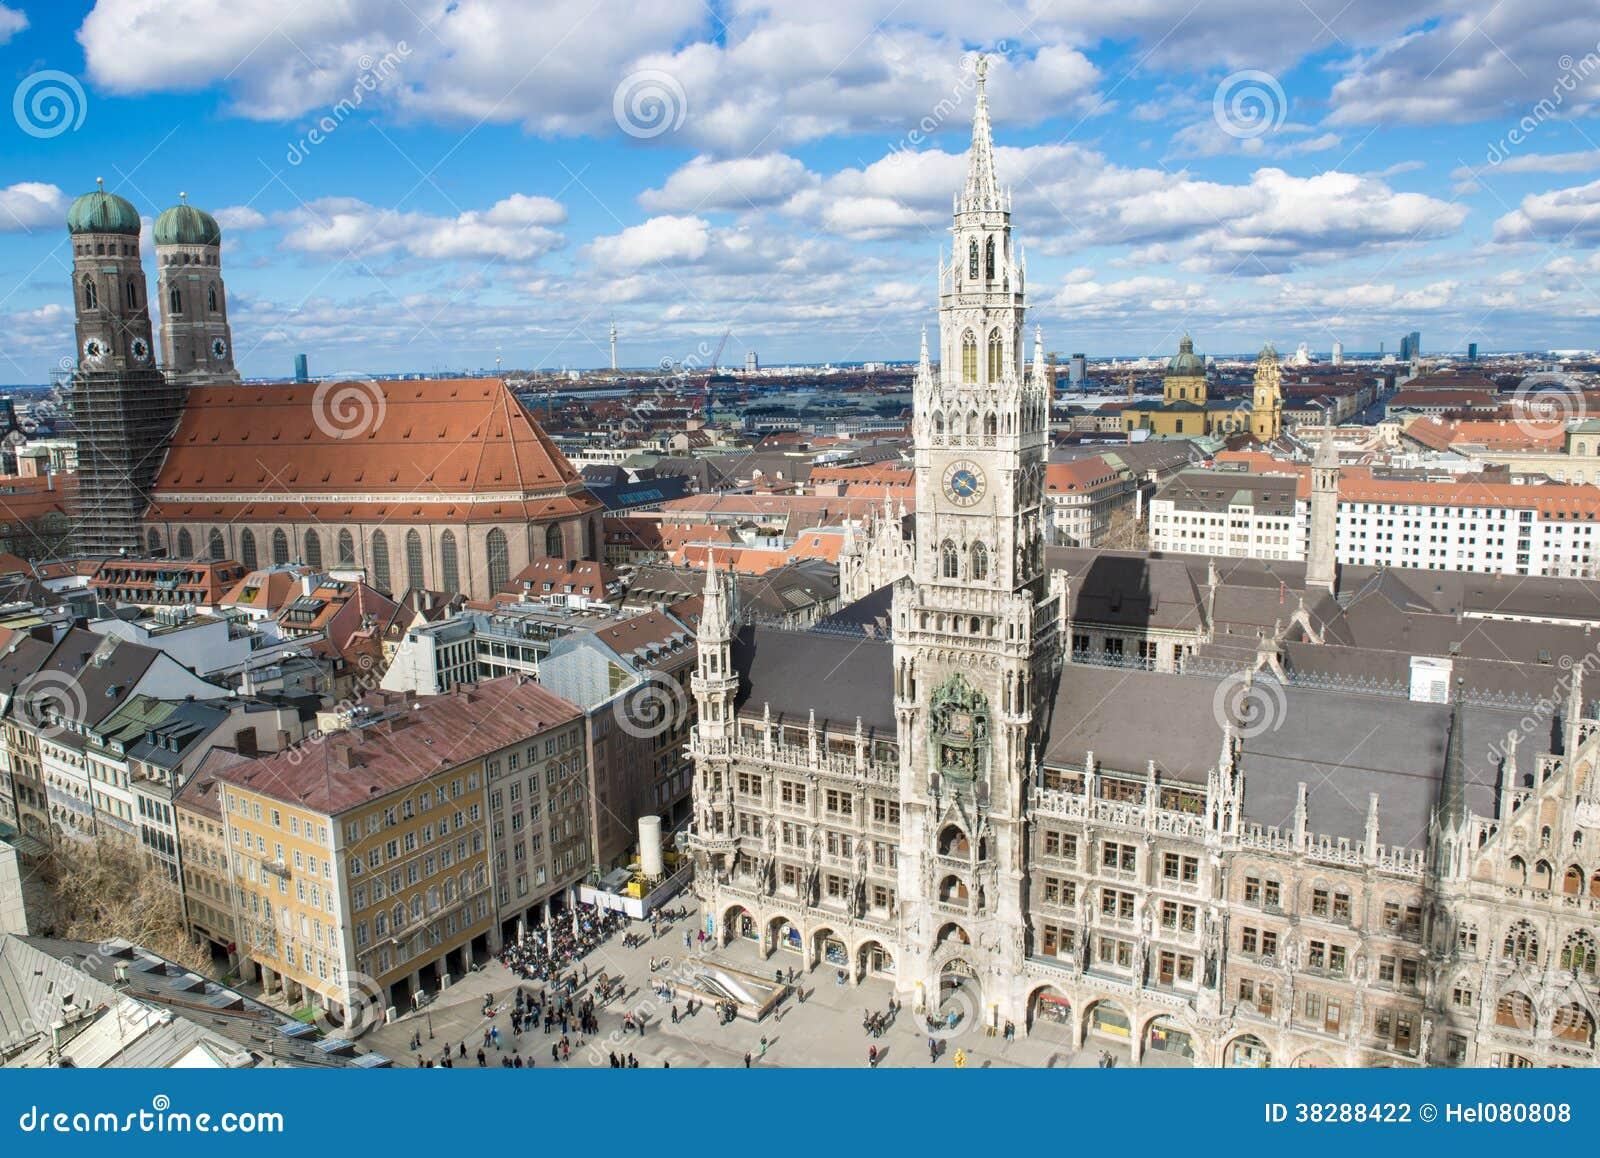 Widok z lotu ptaka Monachium